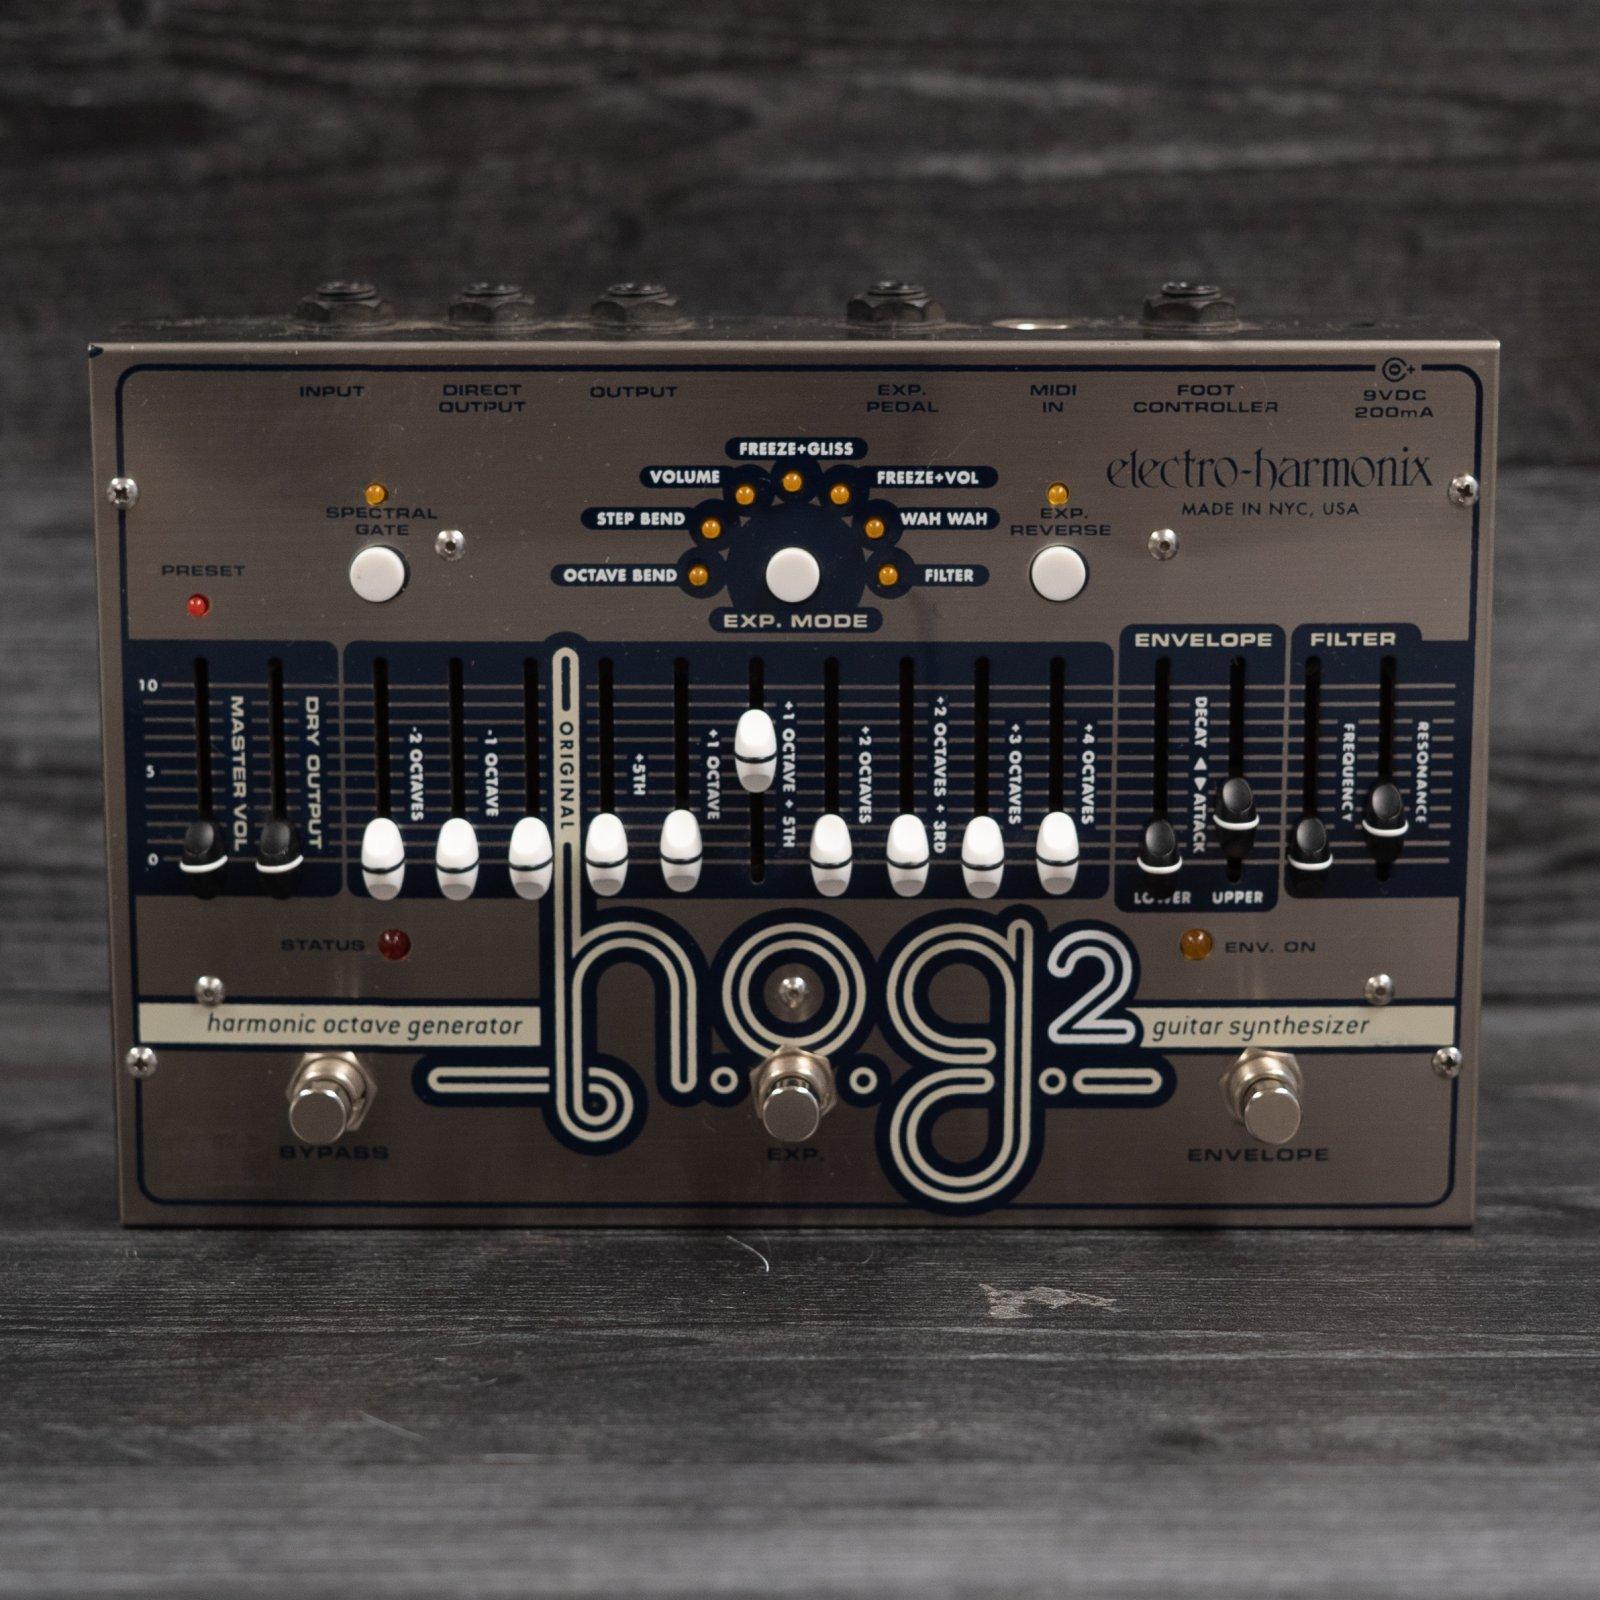 Electro-Harmonix HOG 2 Harmonic Octave Generator (NOS)